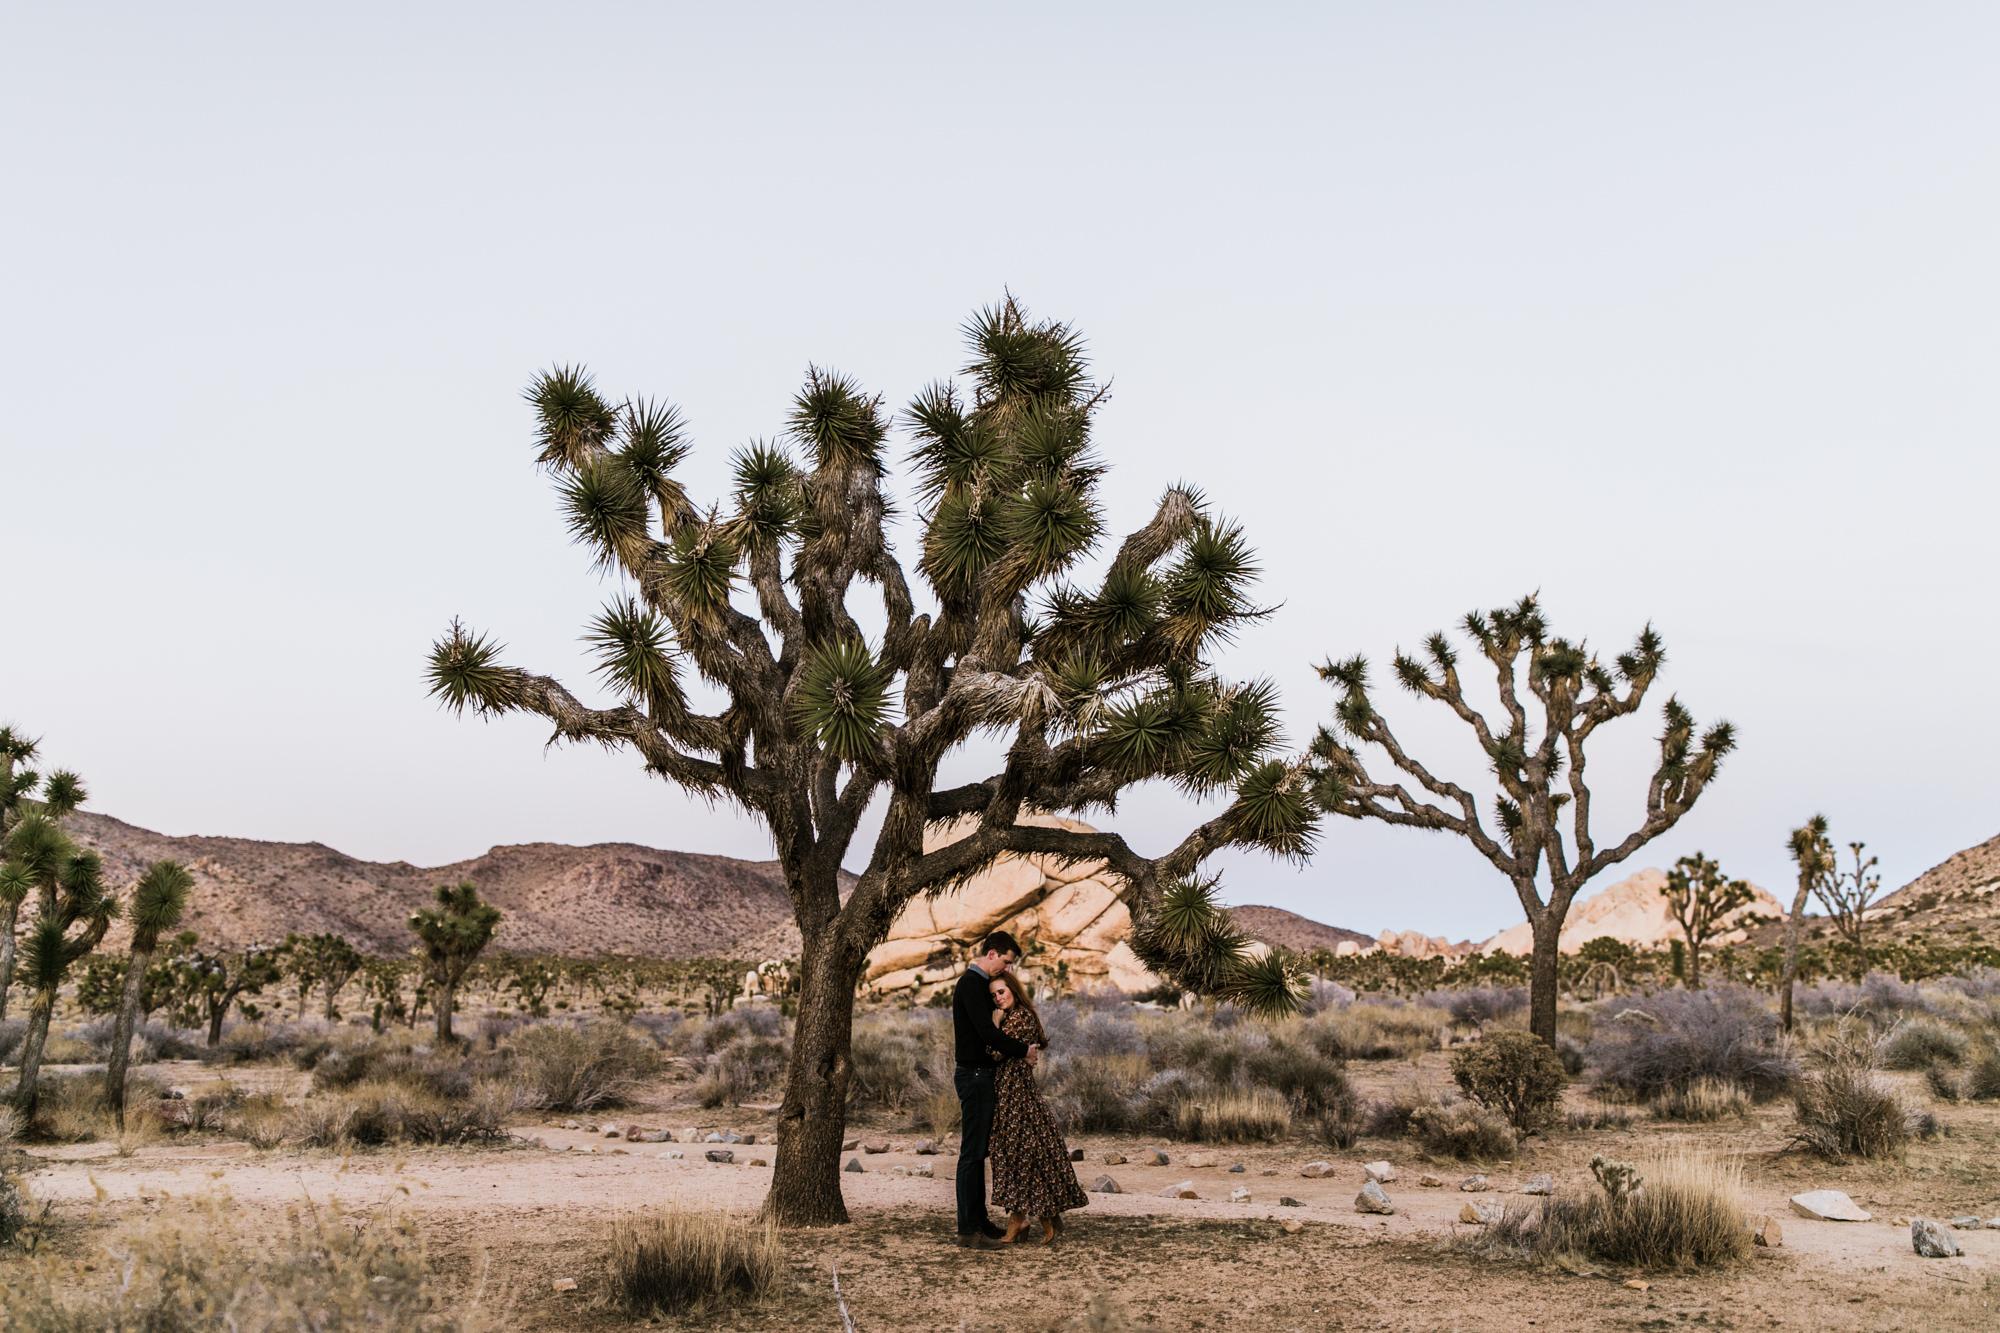 Adventurous Desert Engagement Session Joshua Tree Elopement Photographer Adventure Wedding Elopement Photographers In Moab Yosemite And Beyond The Hearnes